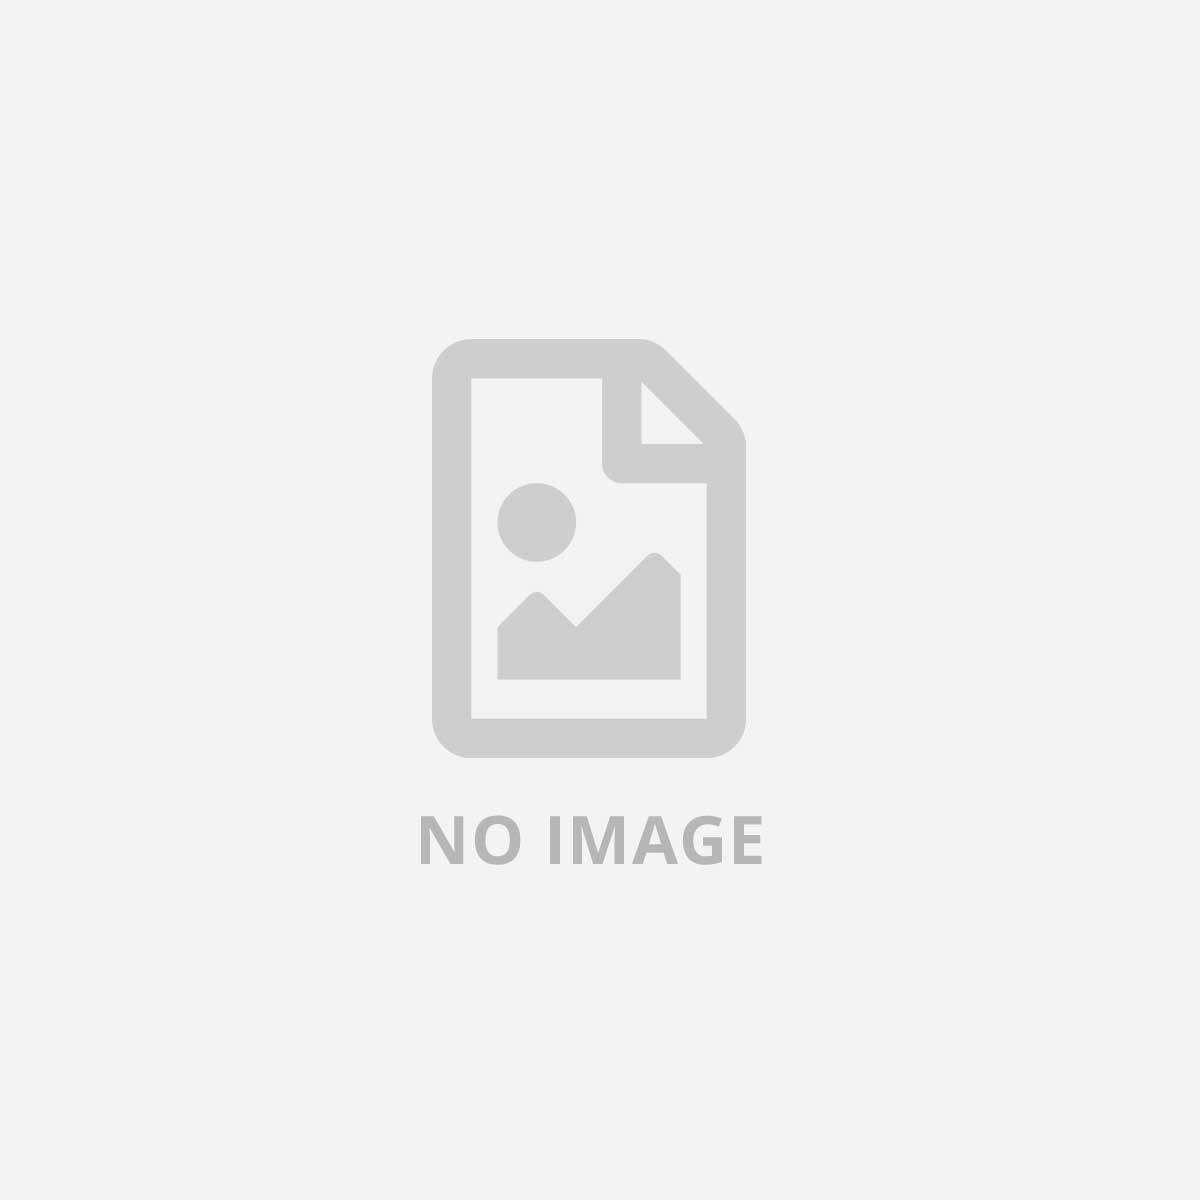 HAMLET DESKTOP WEBCAM FULL HD 16:9 1080P